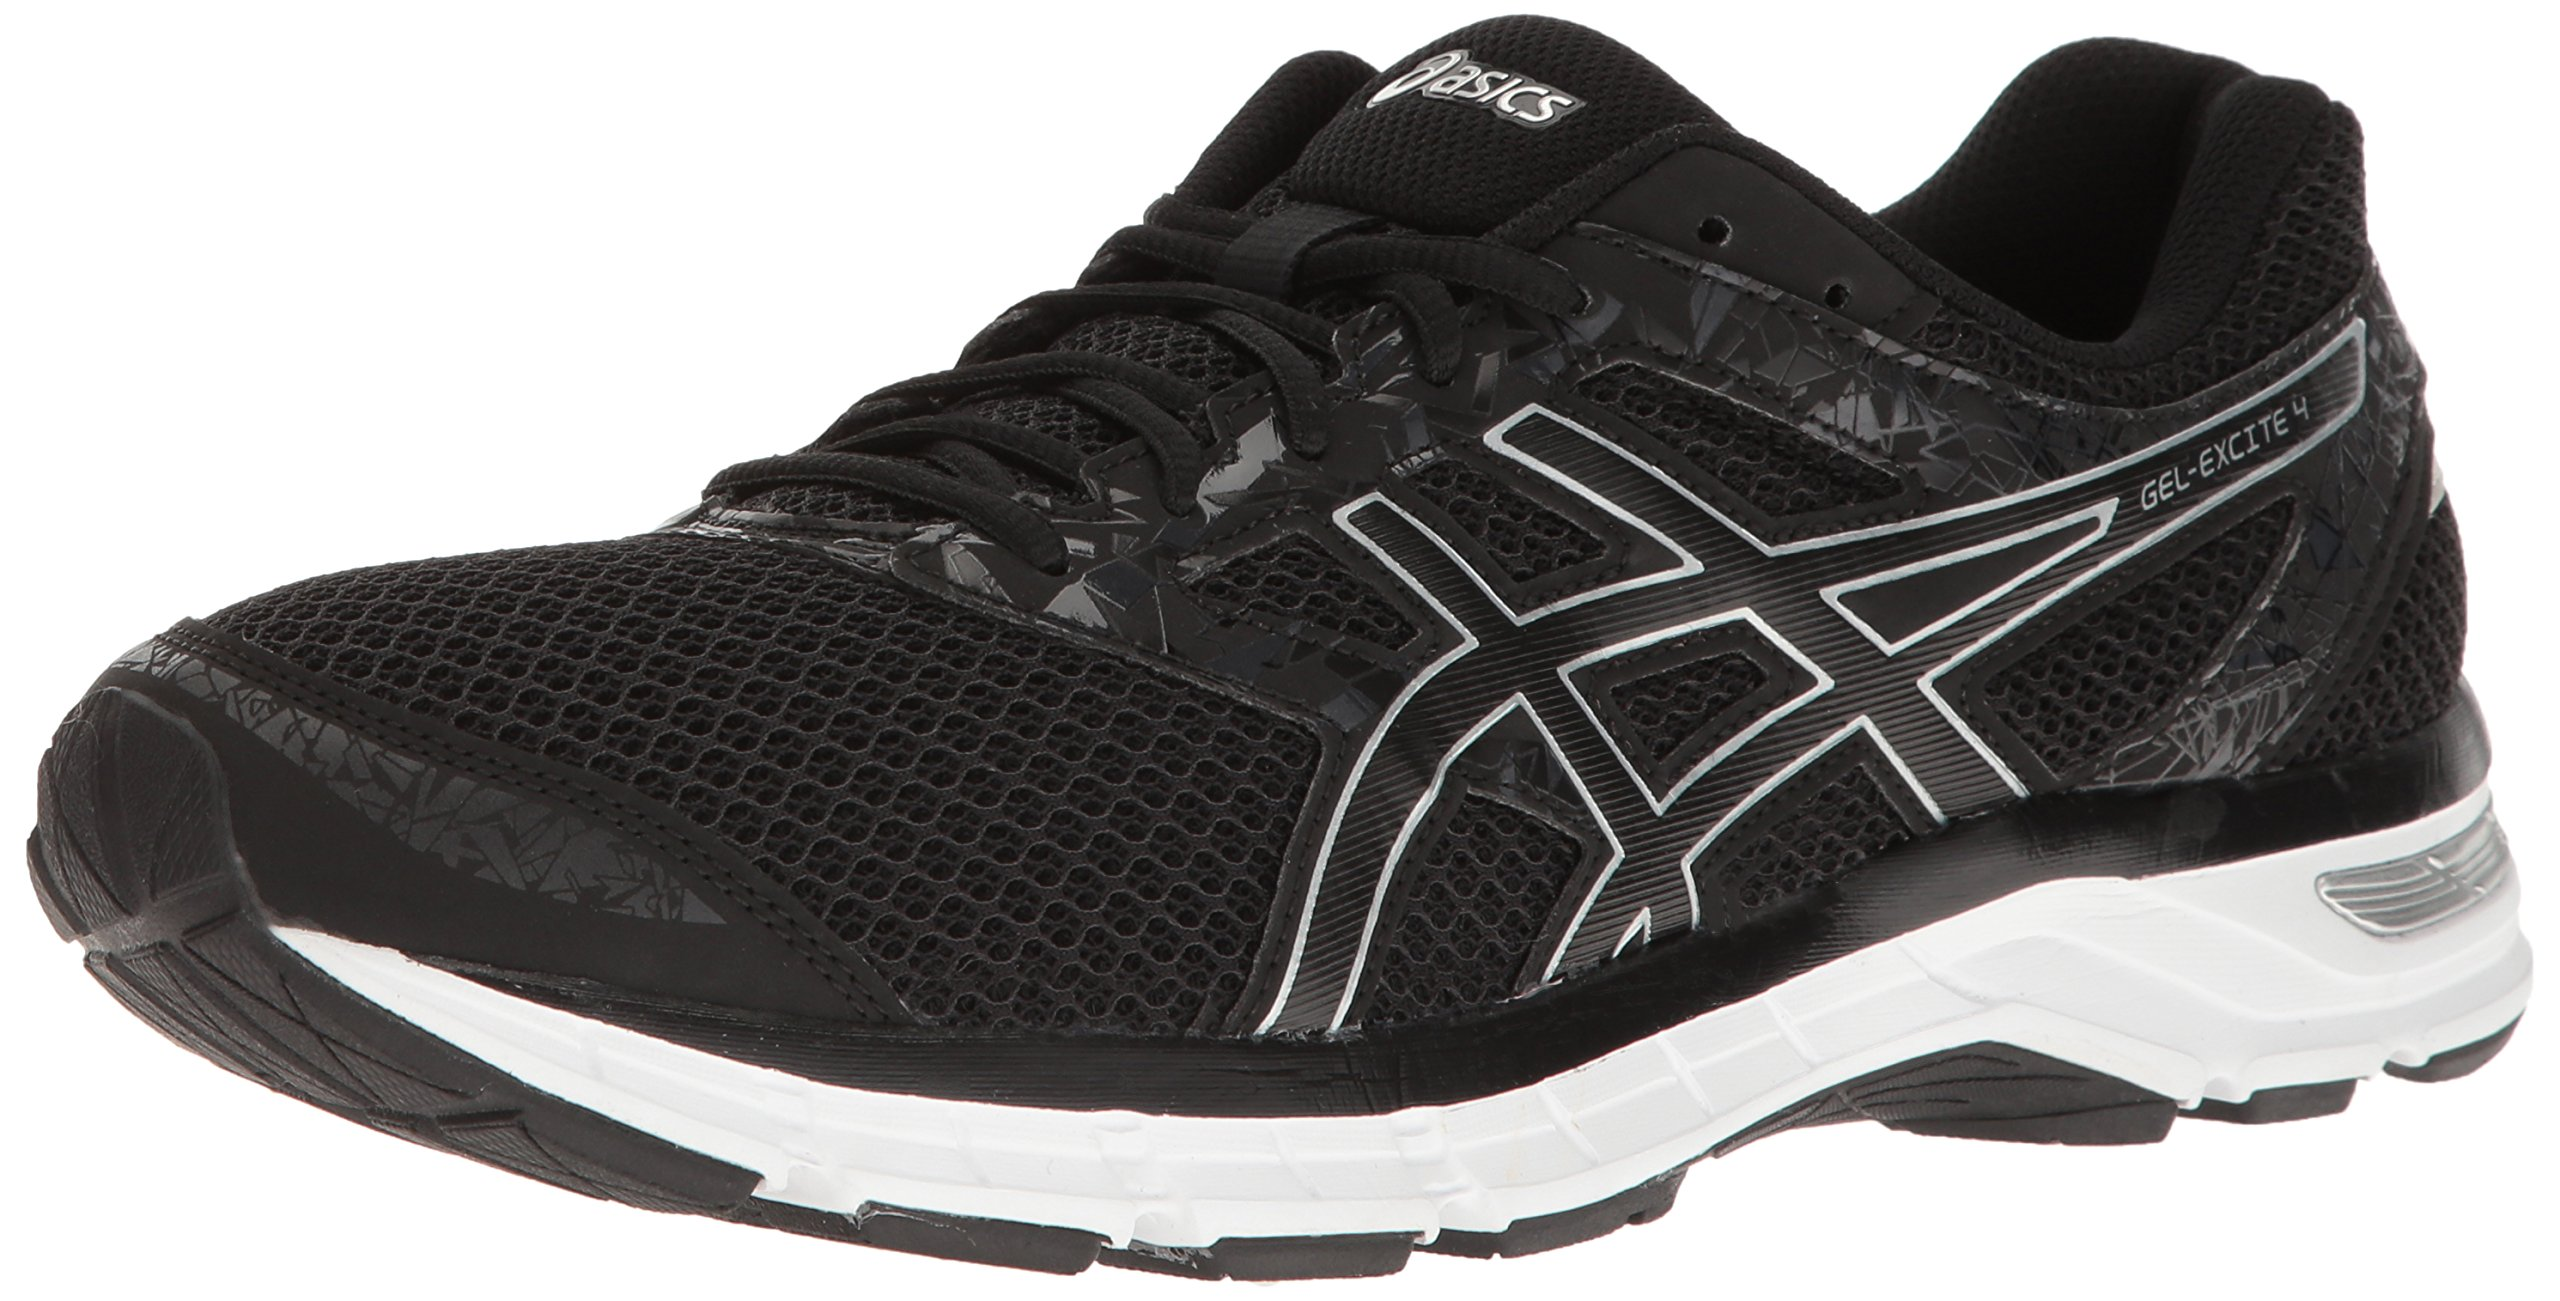 ASICS Men's Gel Excite 4 Running Shoe, BlackOnyxSilver, 14 M US